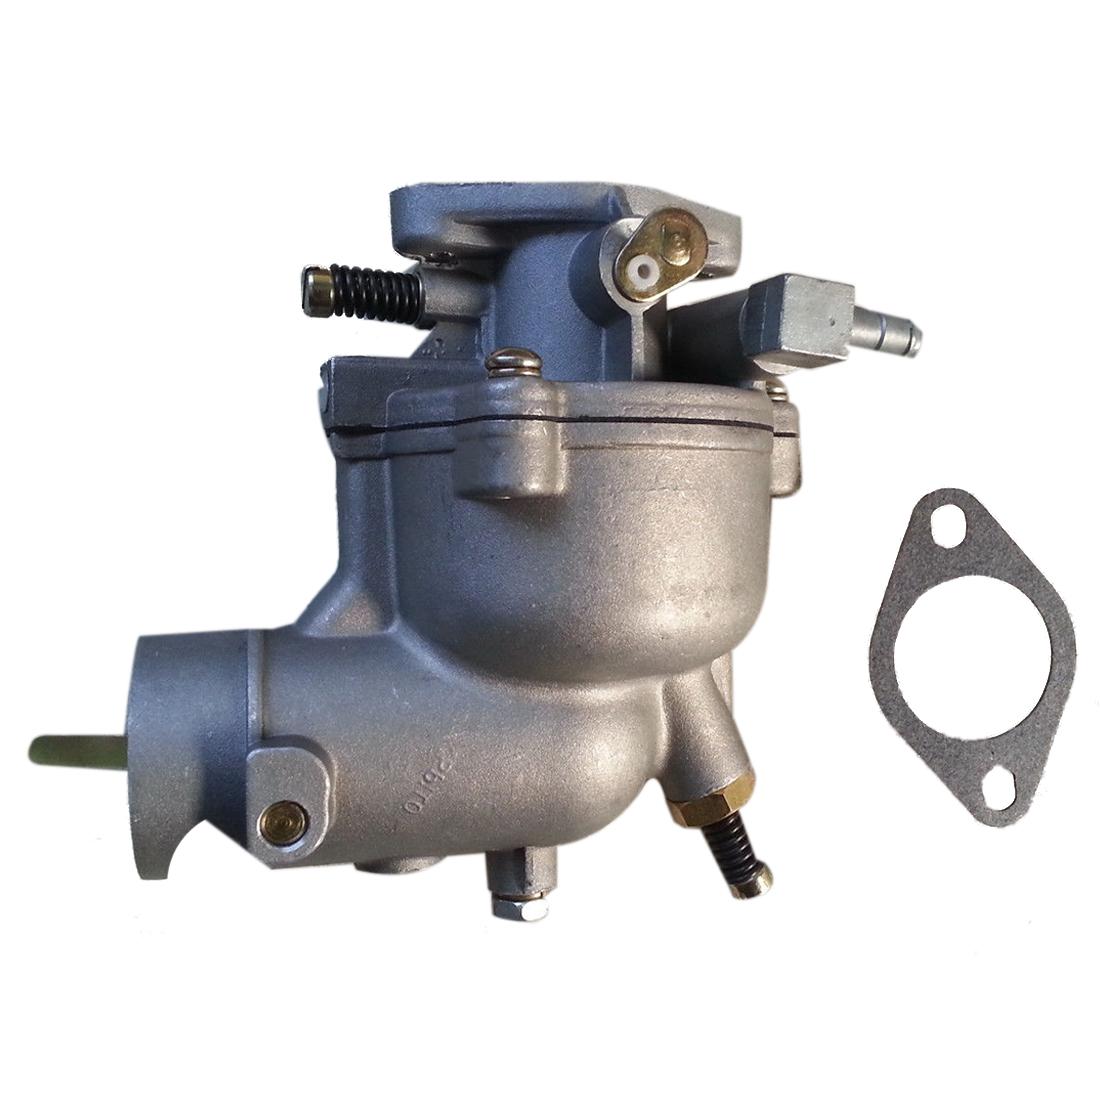 New Carburetor For Briggs Stratton 390323 394228 789